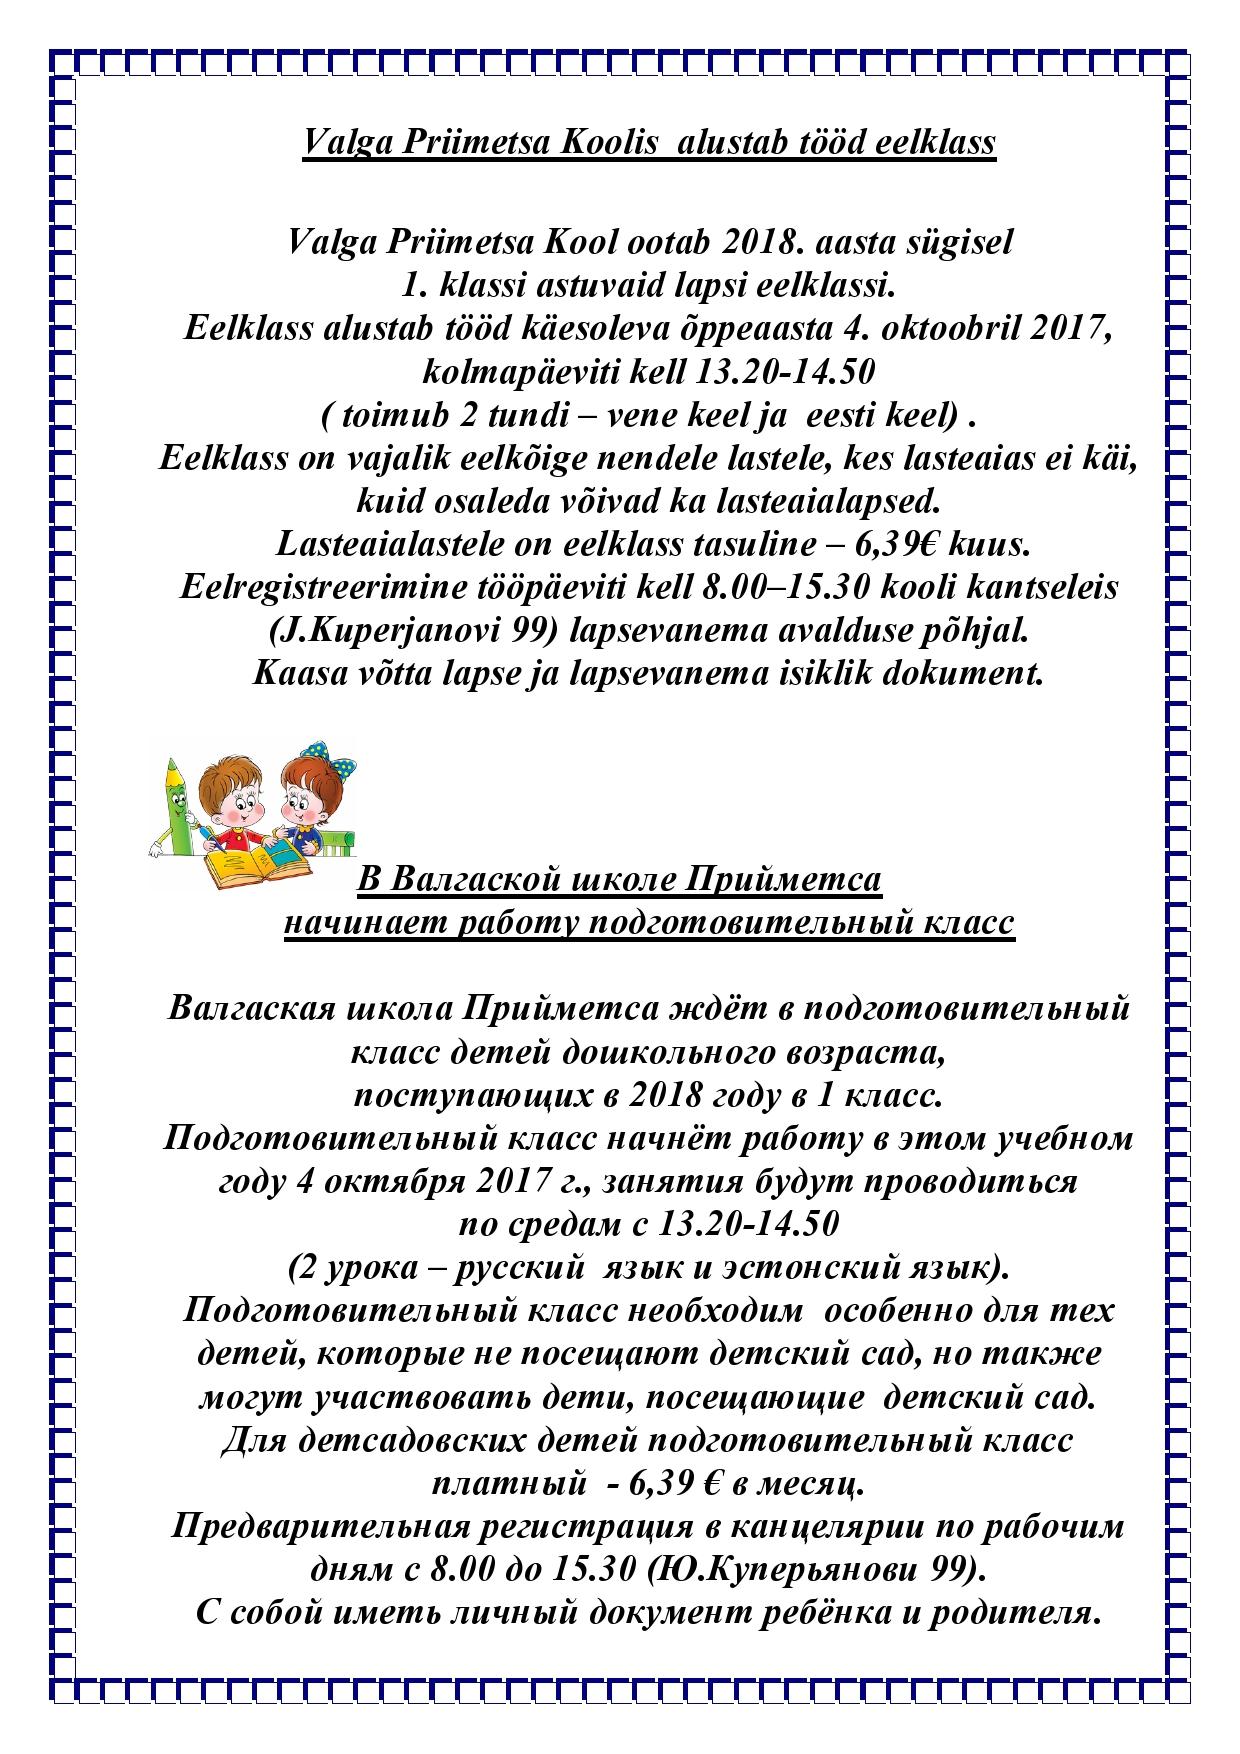 http://vpmk.edu.ee/wp-content/uploads/2017/09/Eelkooli-reklaam-17-18.jpg